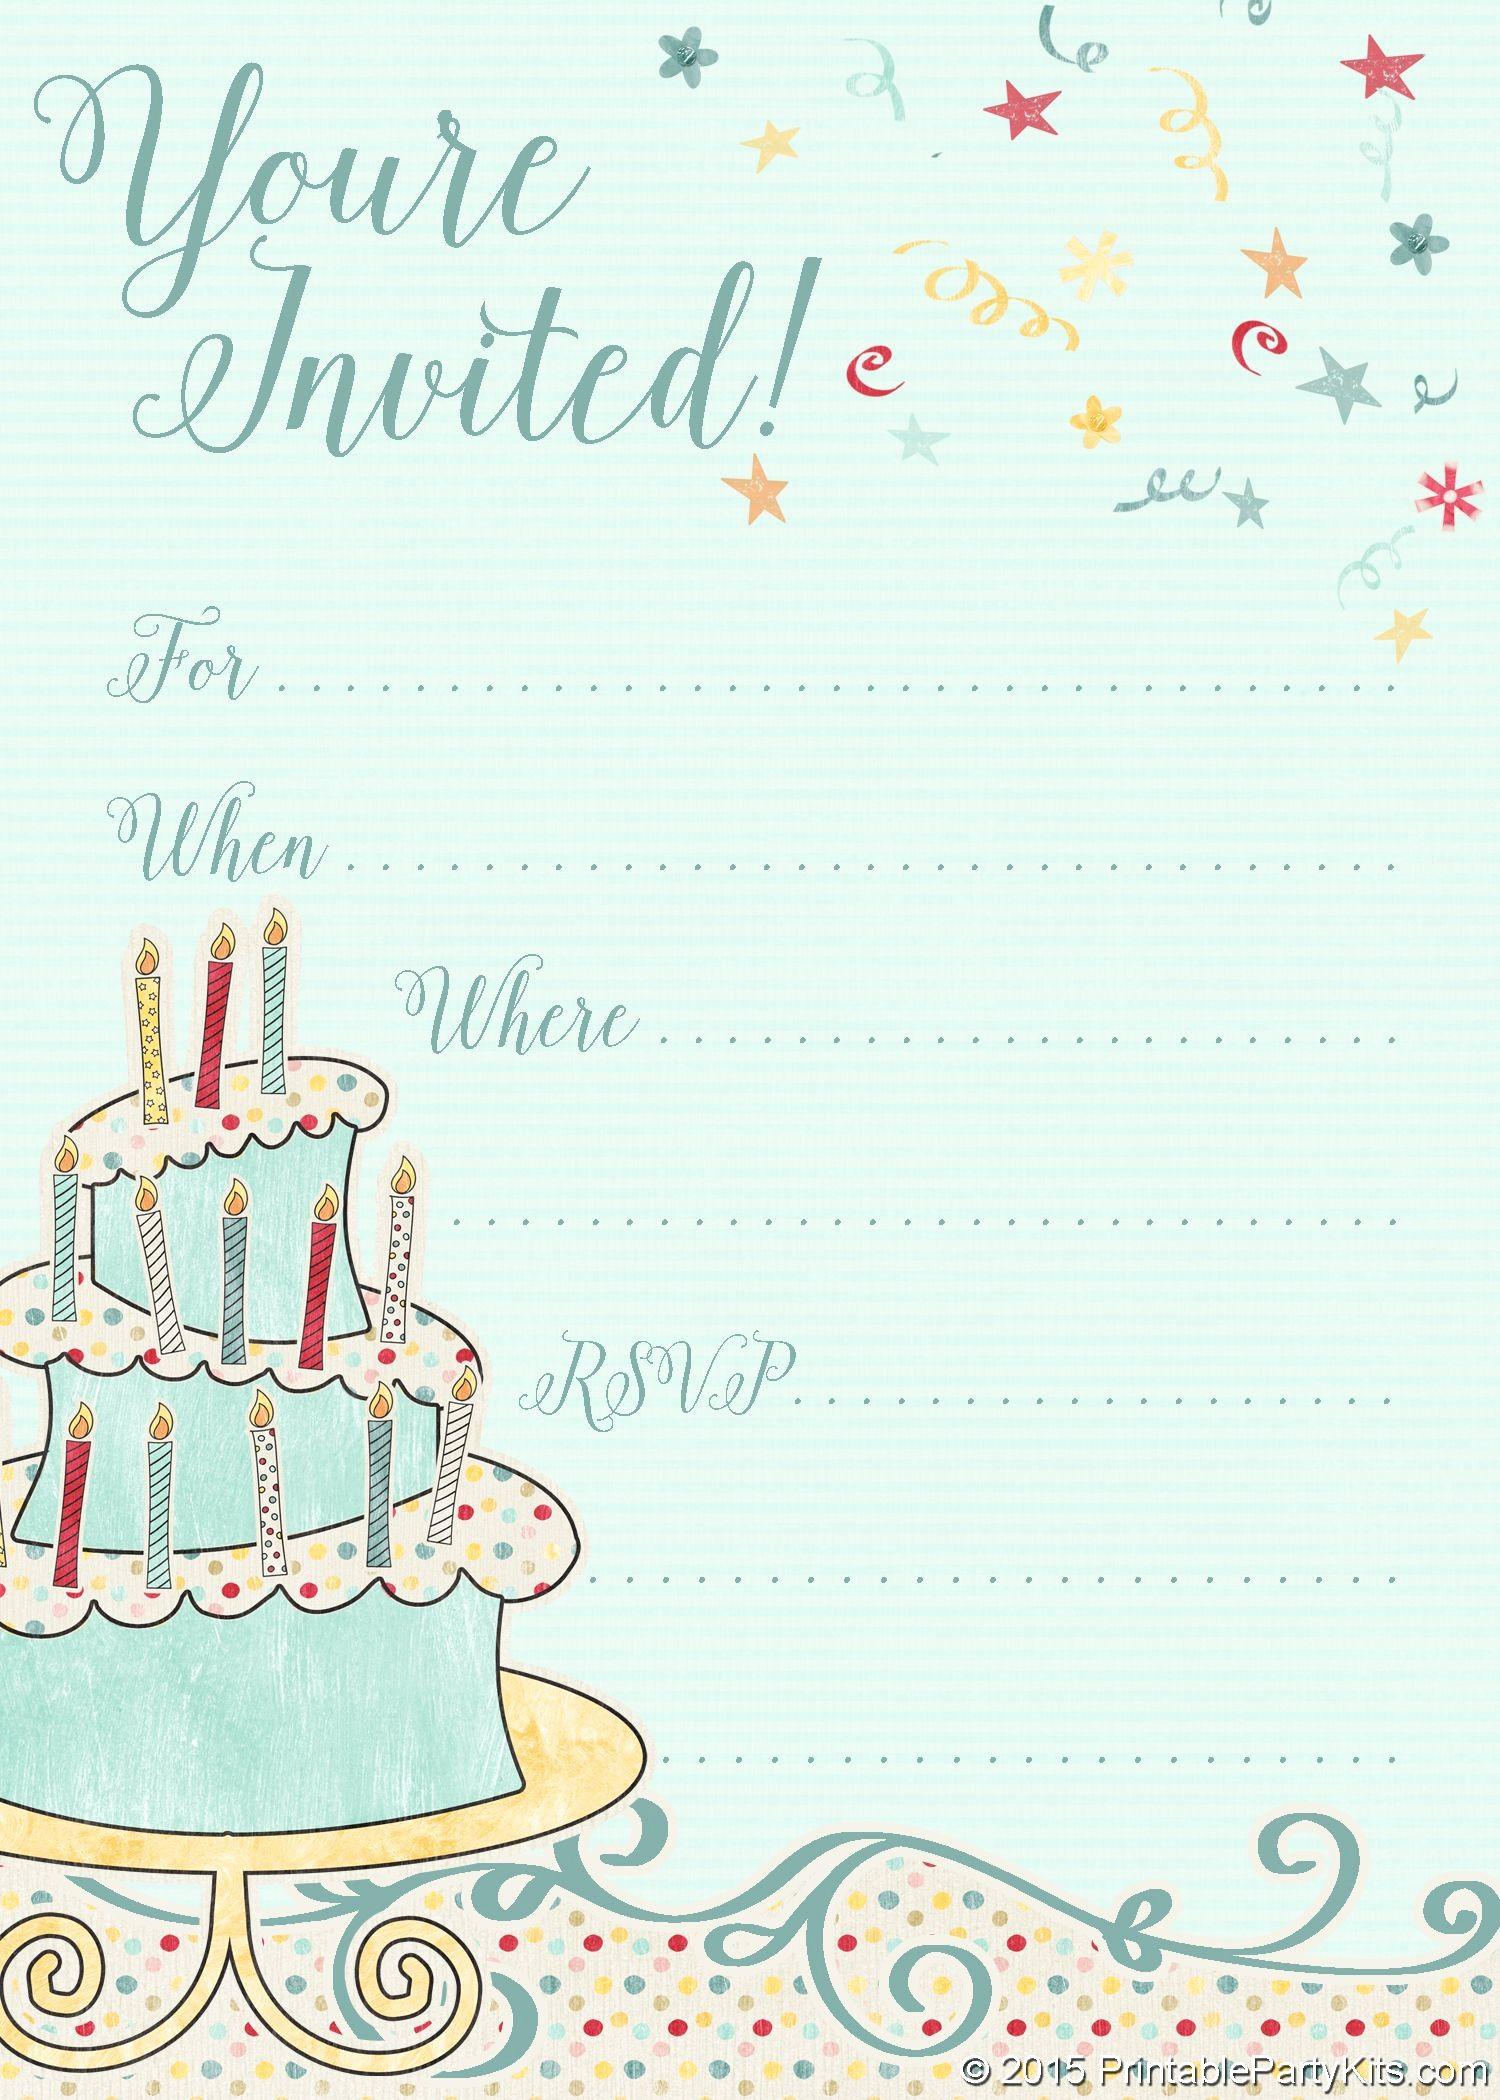 Free Templates for Birthday Invitations Fresh Free Printable Whimsical Birthday Party Invitation